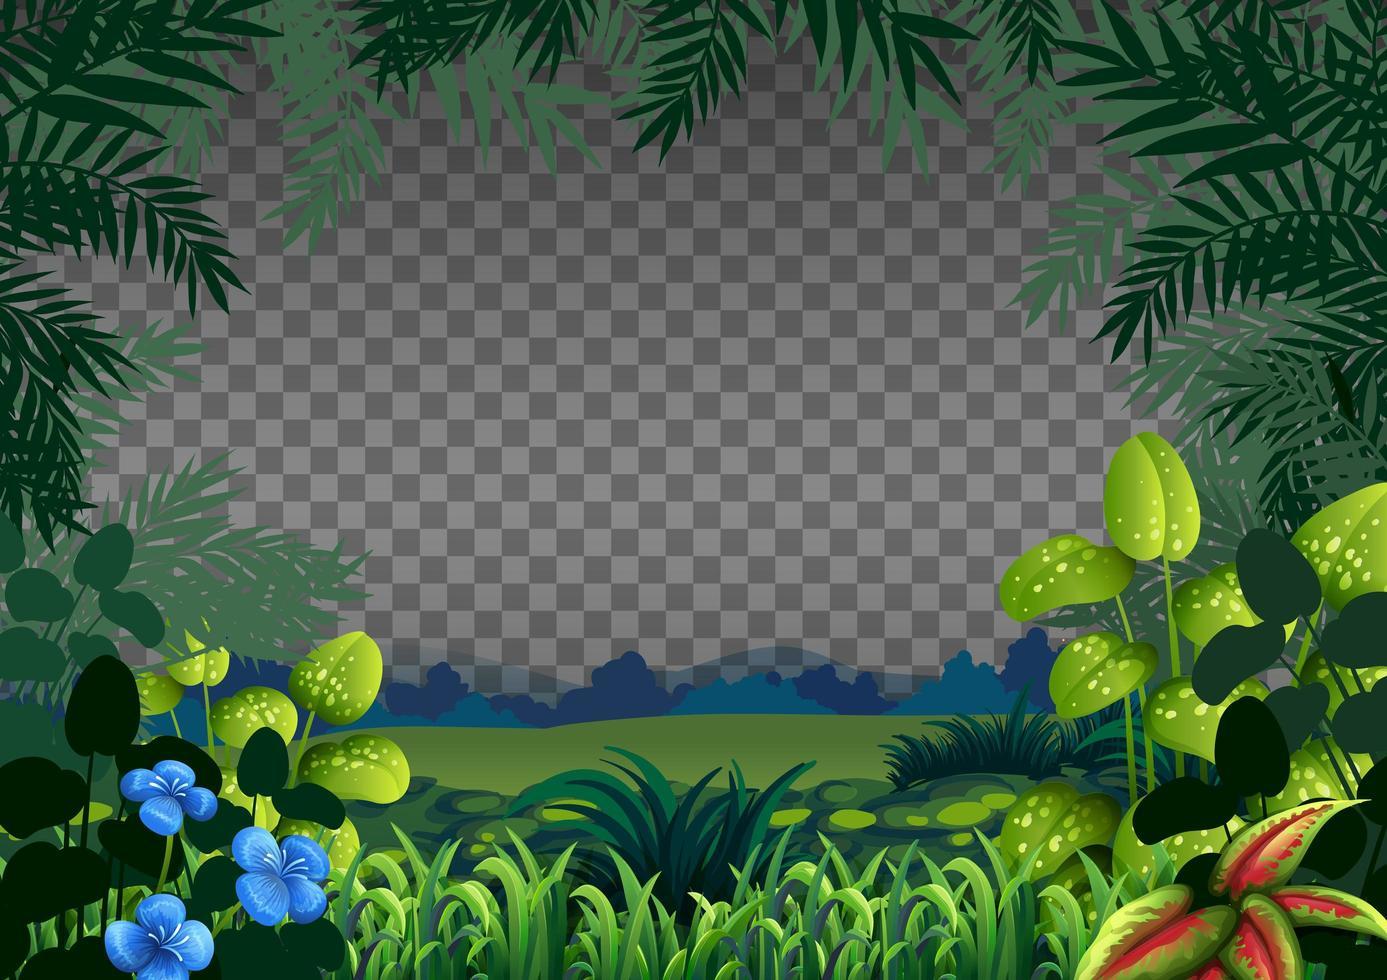 tom natur scen landskap på transparent bakgrund vektor